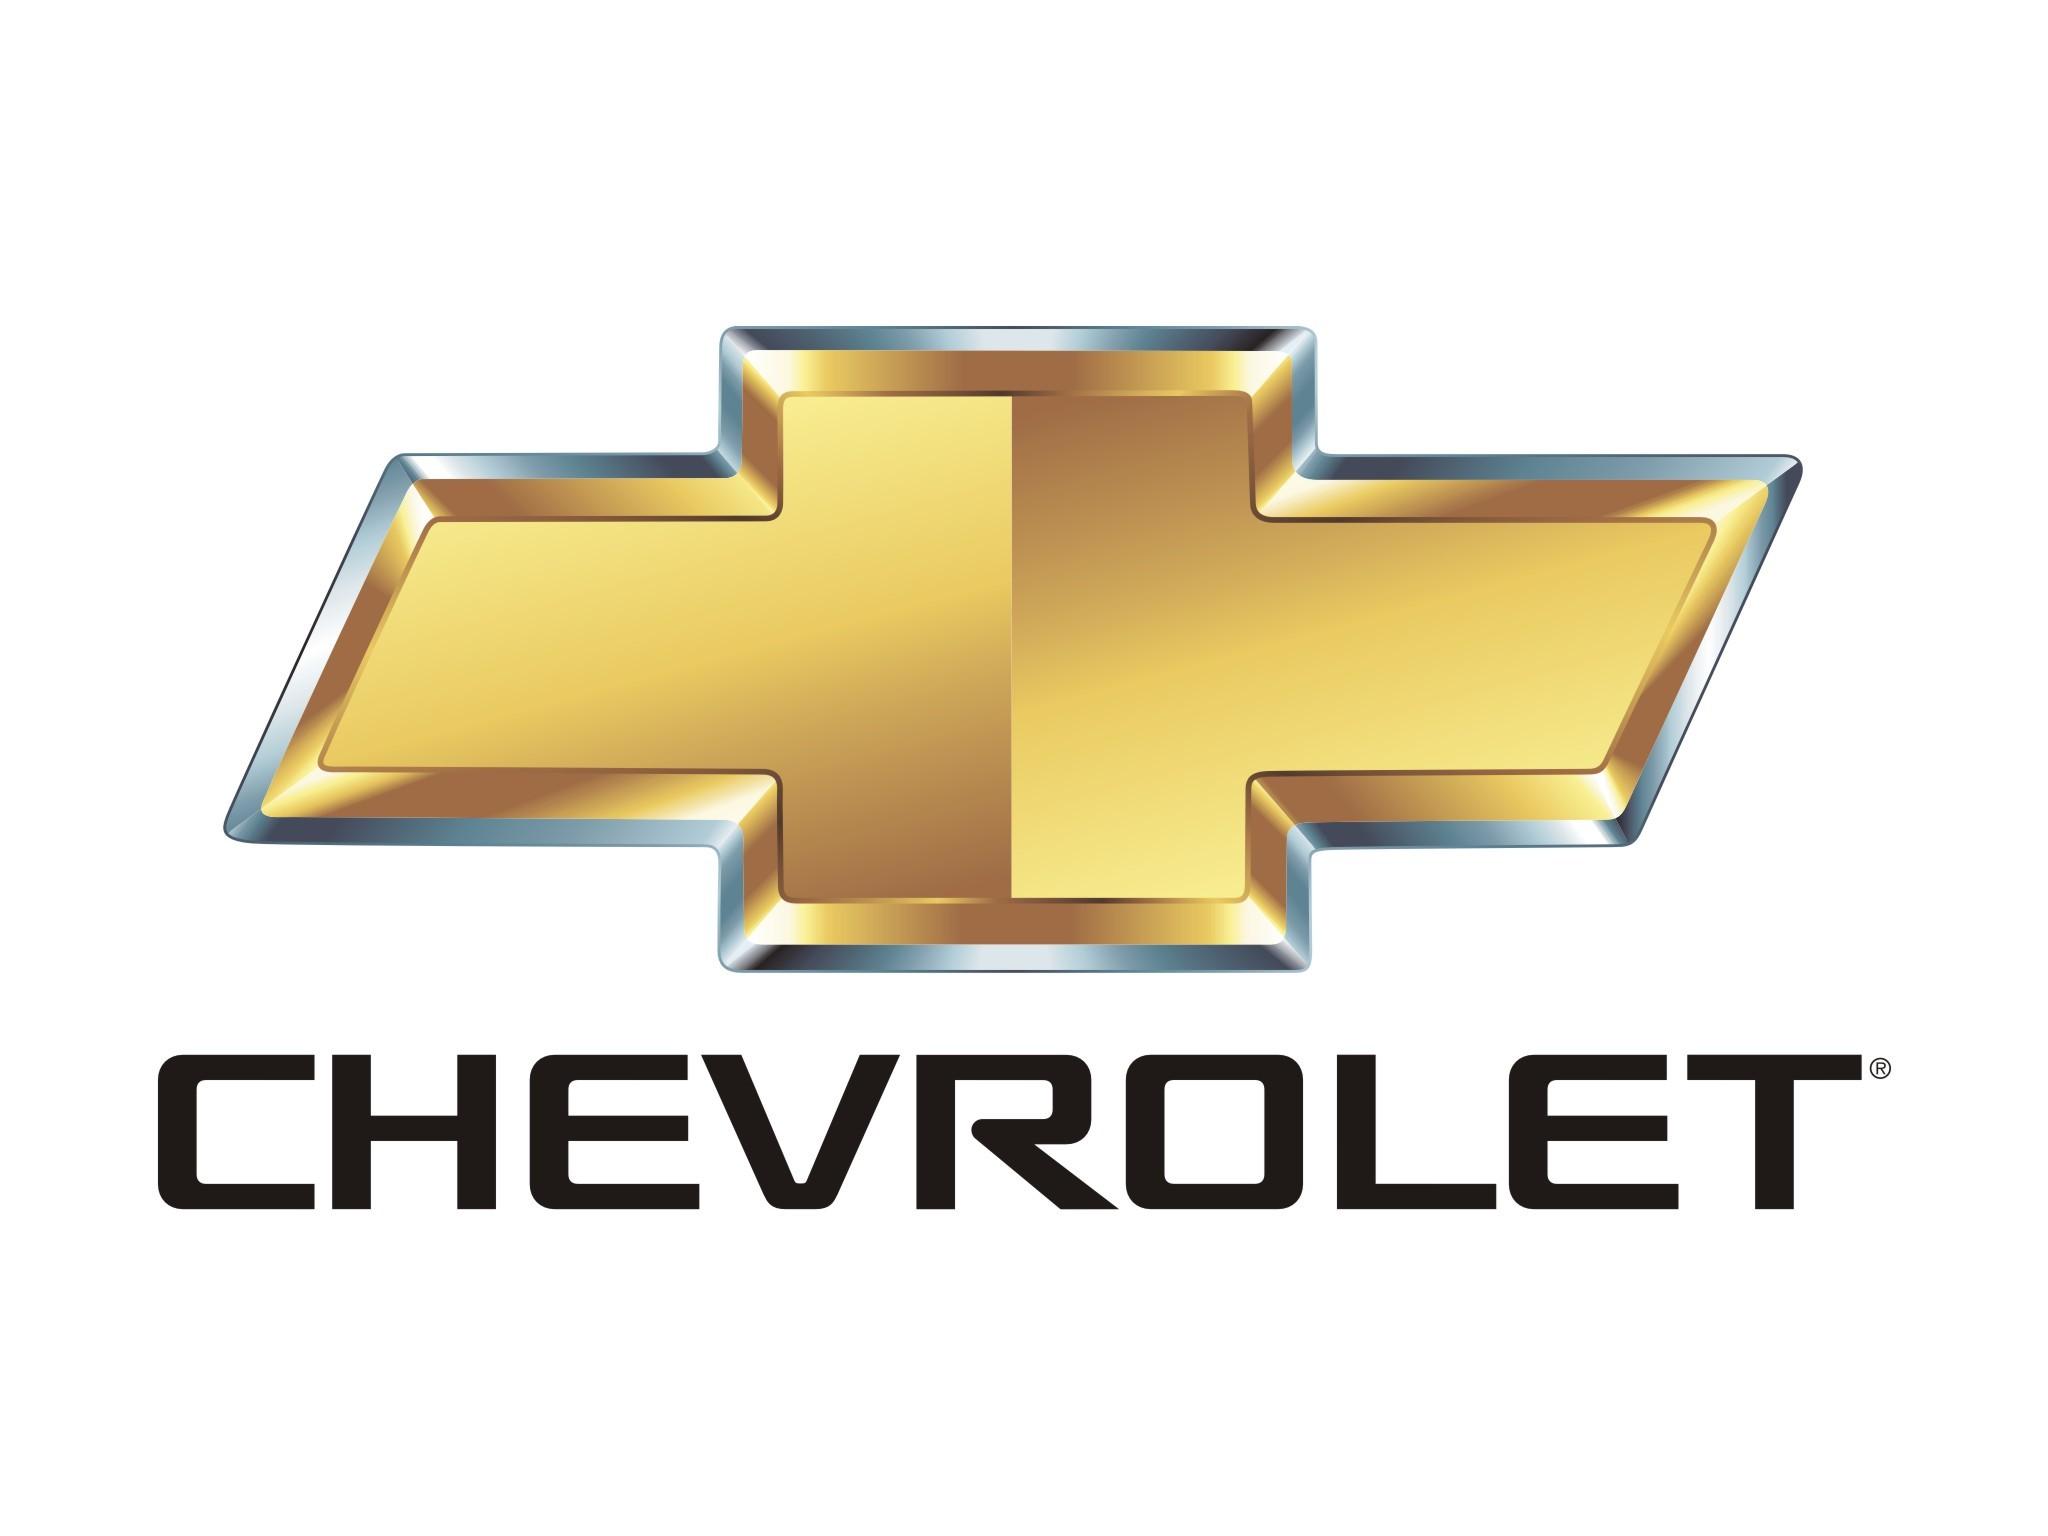 Chevy logo wallpaper 2048x1536 chevy logo download ipad retina biocorpaavc Images